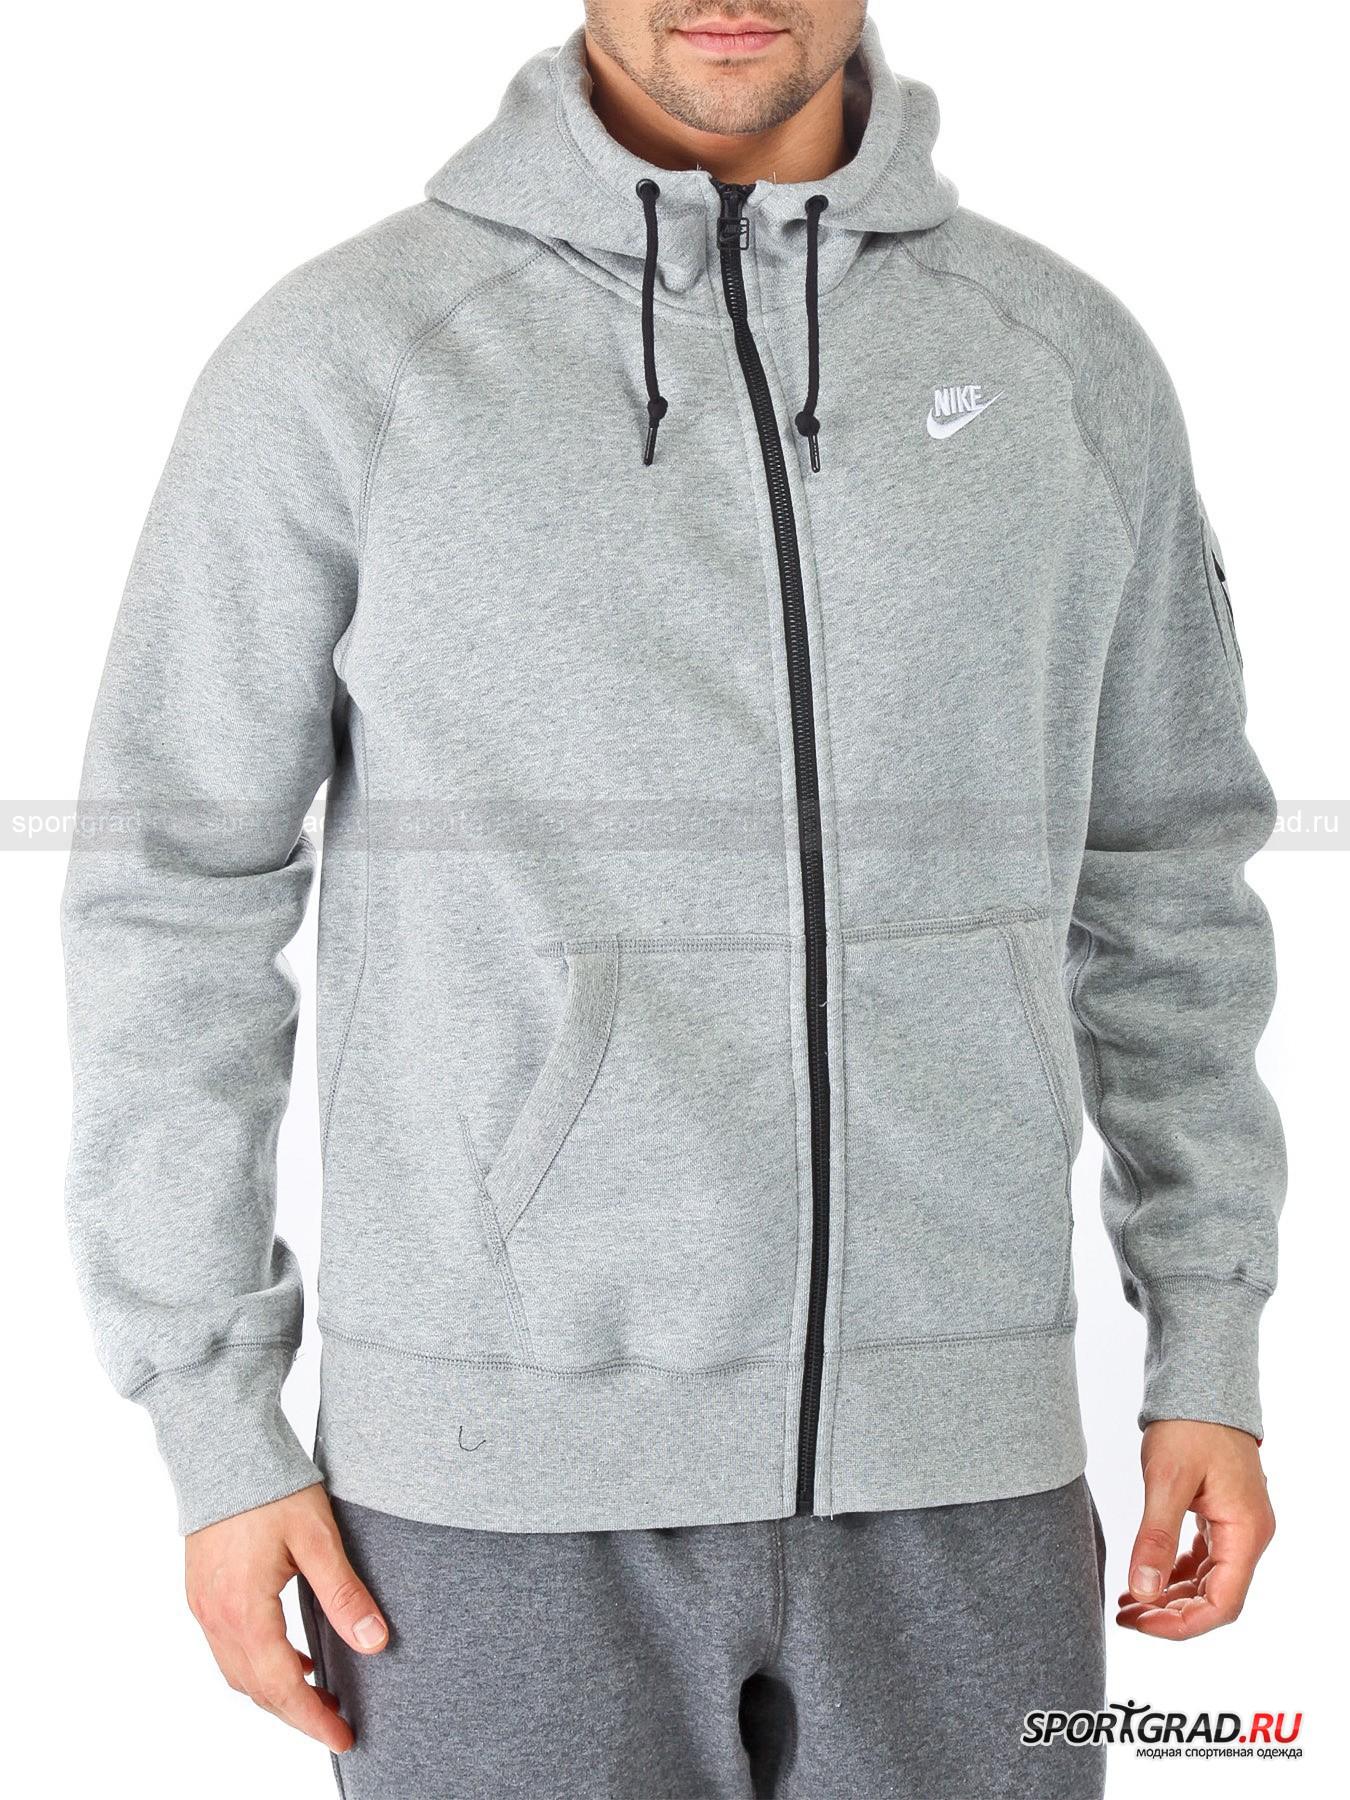 Толстовка мужская Nike Ace Flc fz hoody NIKE с начесом изнутри